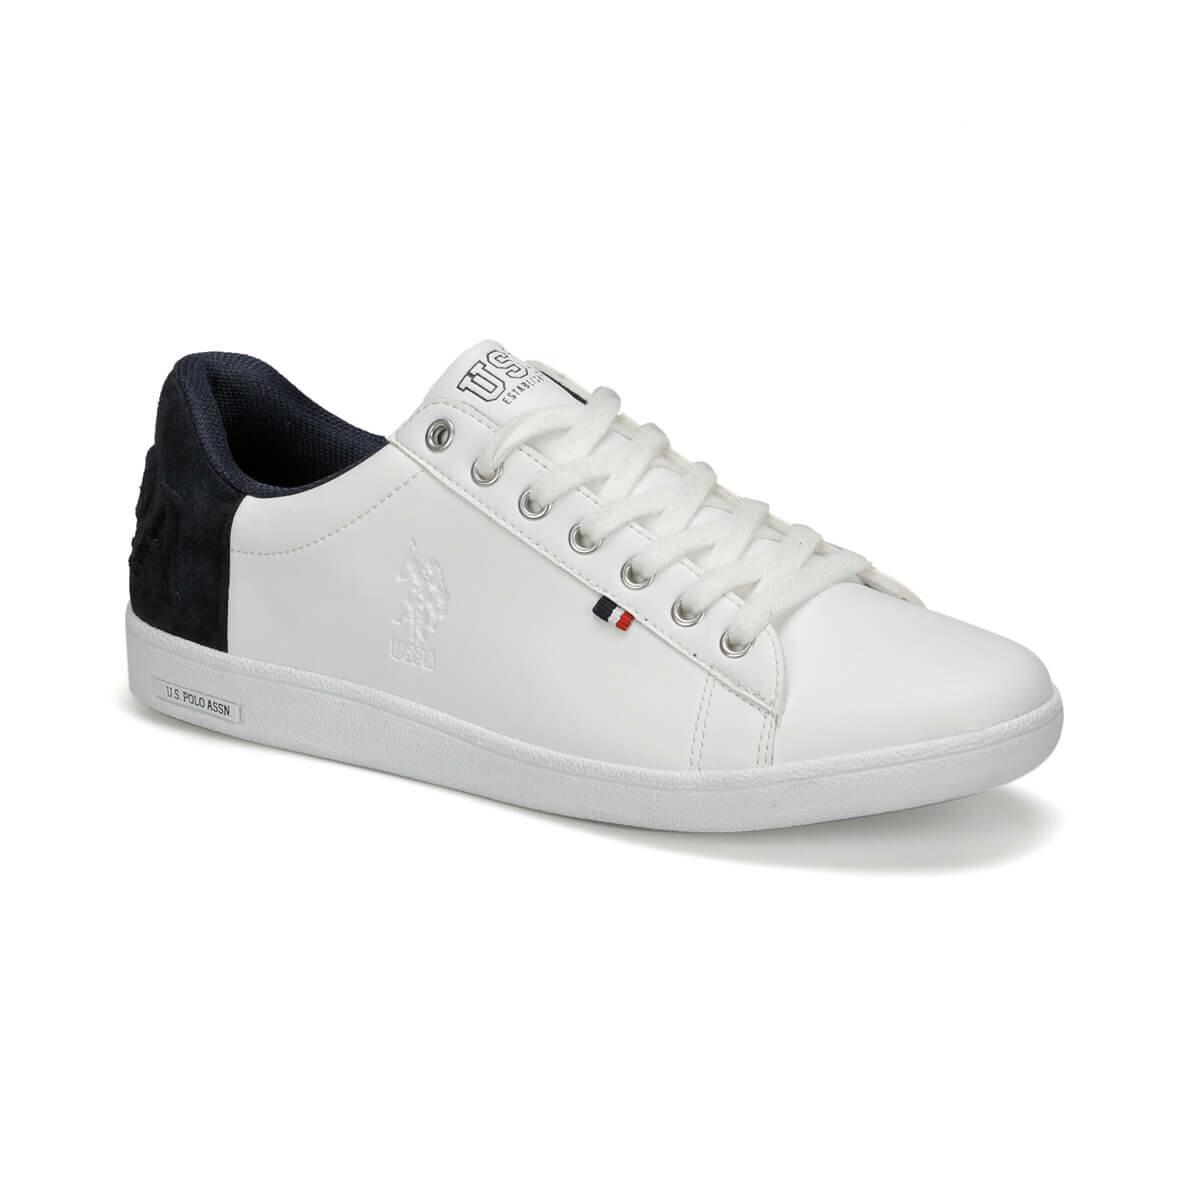 FLO PEDRO 9PR White Men 'S Sneaker Shoes U.S. POLO ASSN.